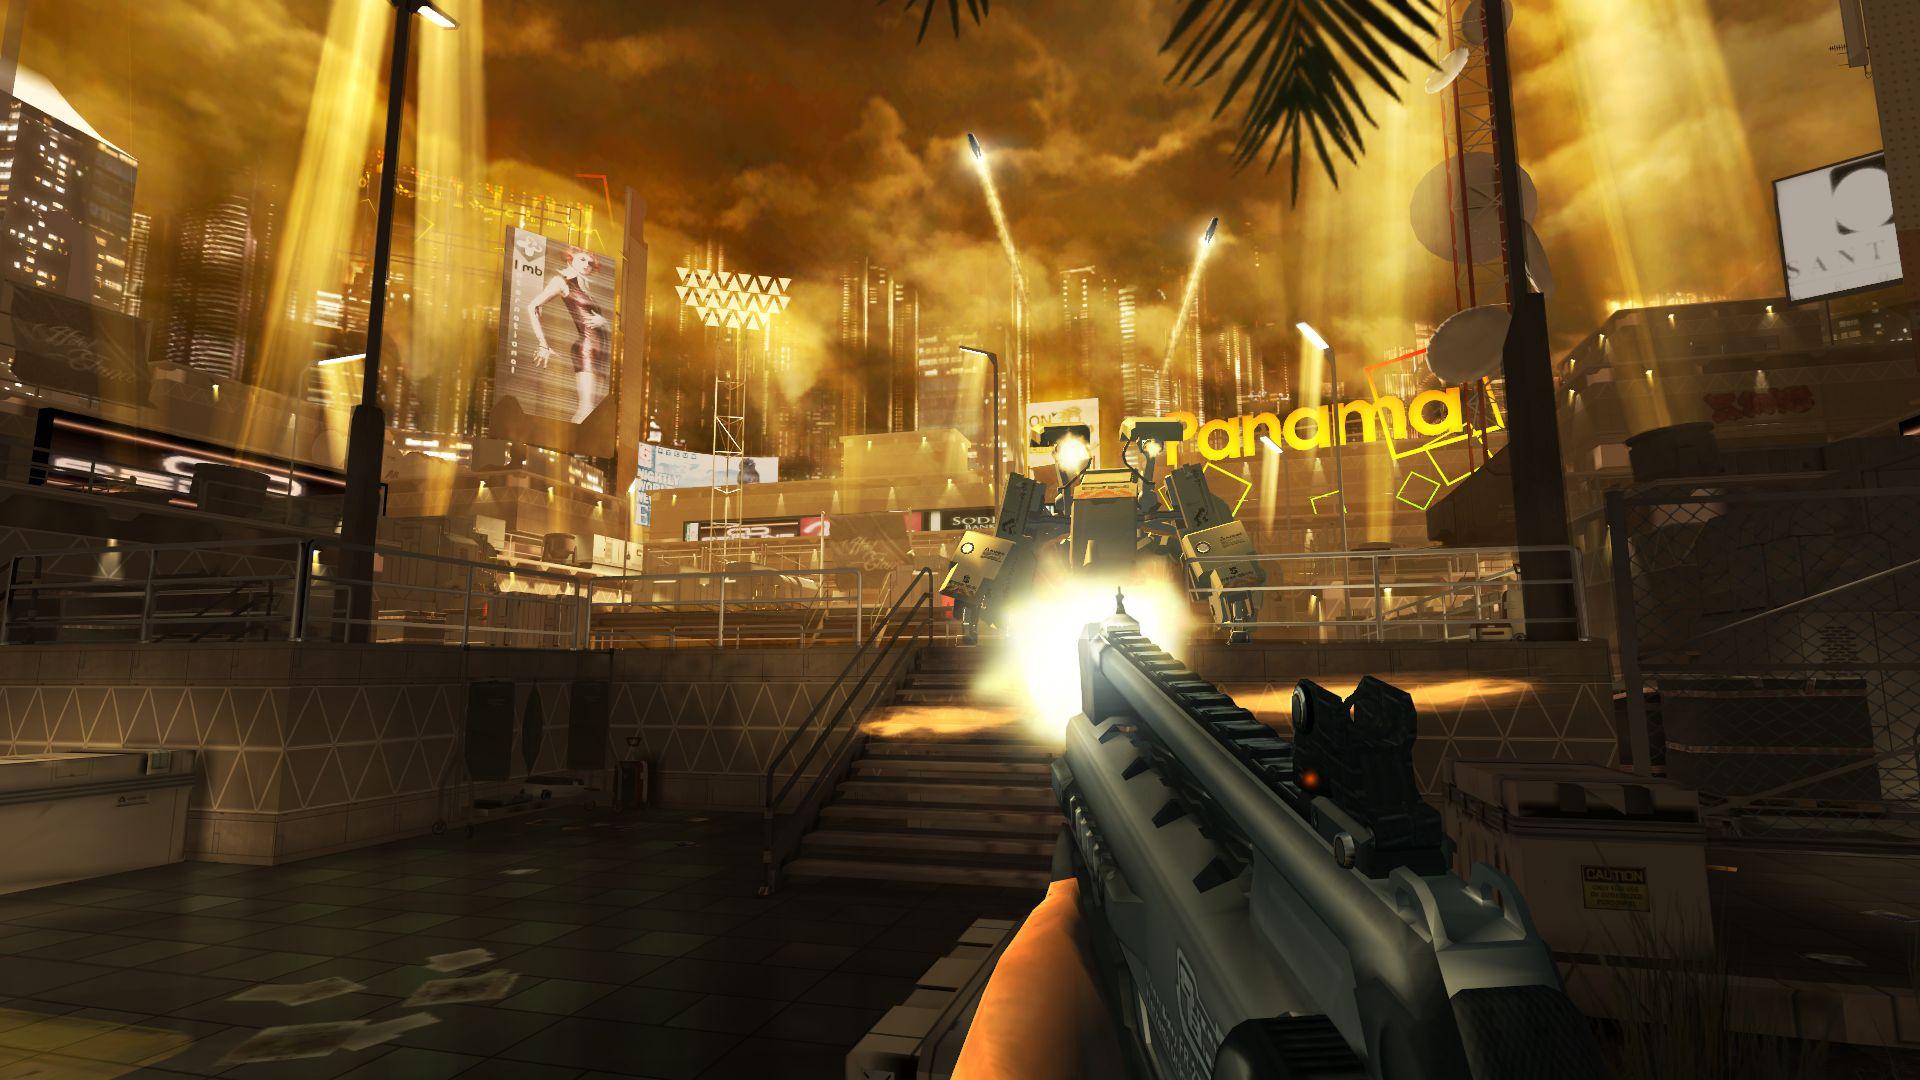 Deus Ex: The Fall - it definitely looks the part